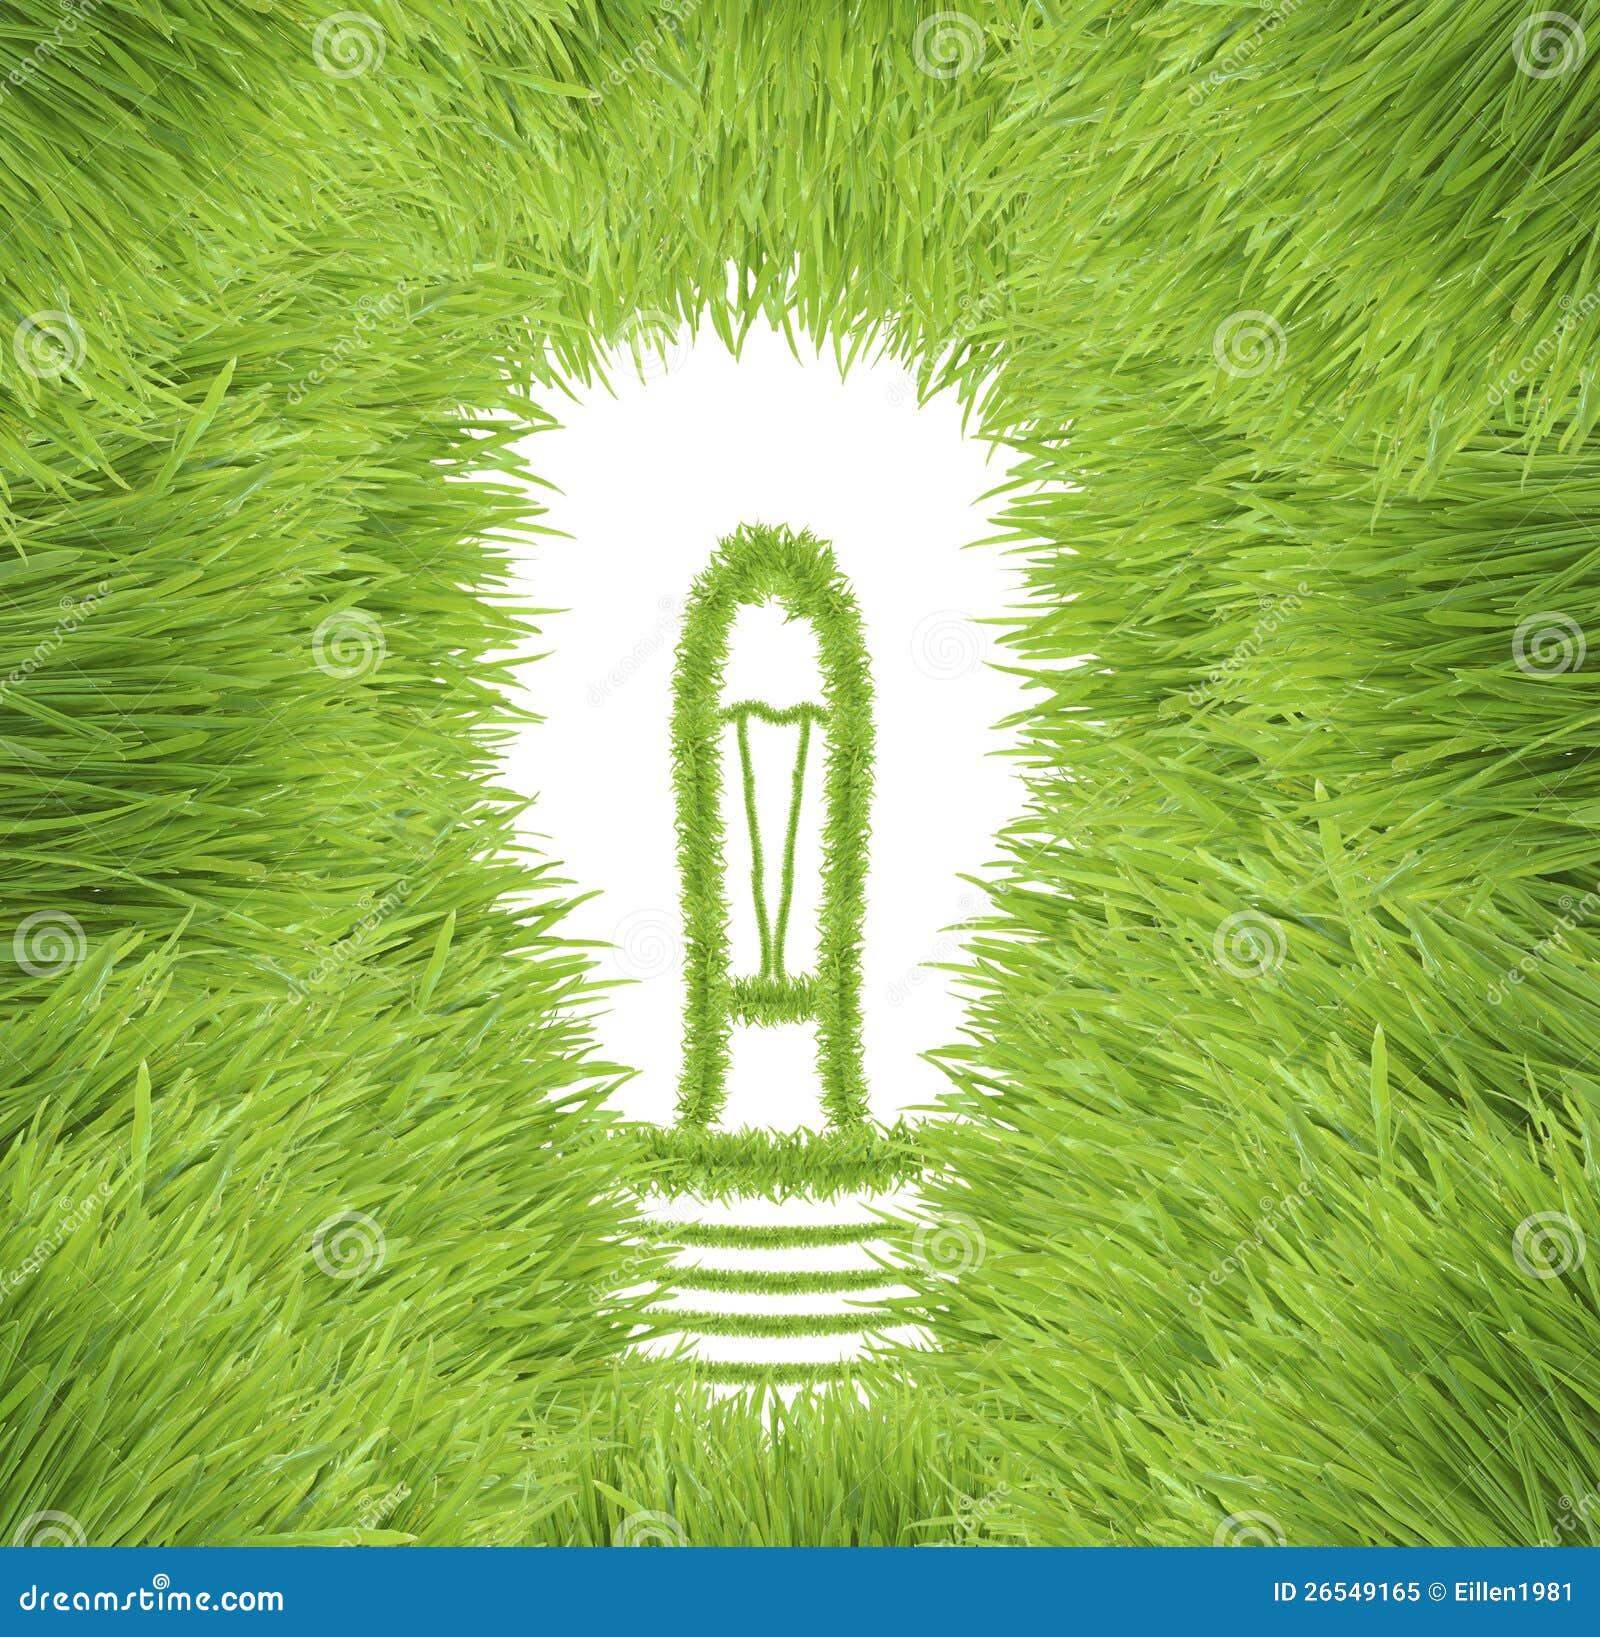 Glühlampe gebildet vom grünen Gras